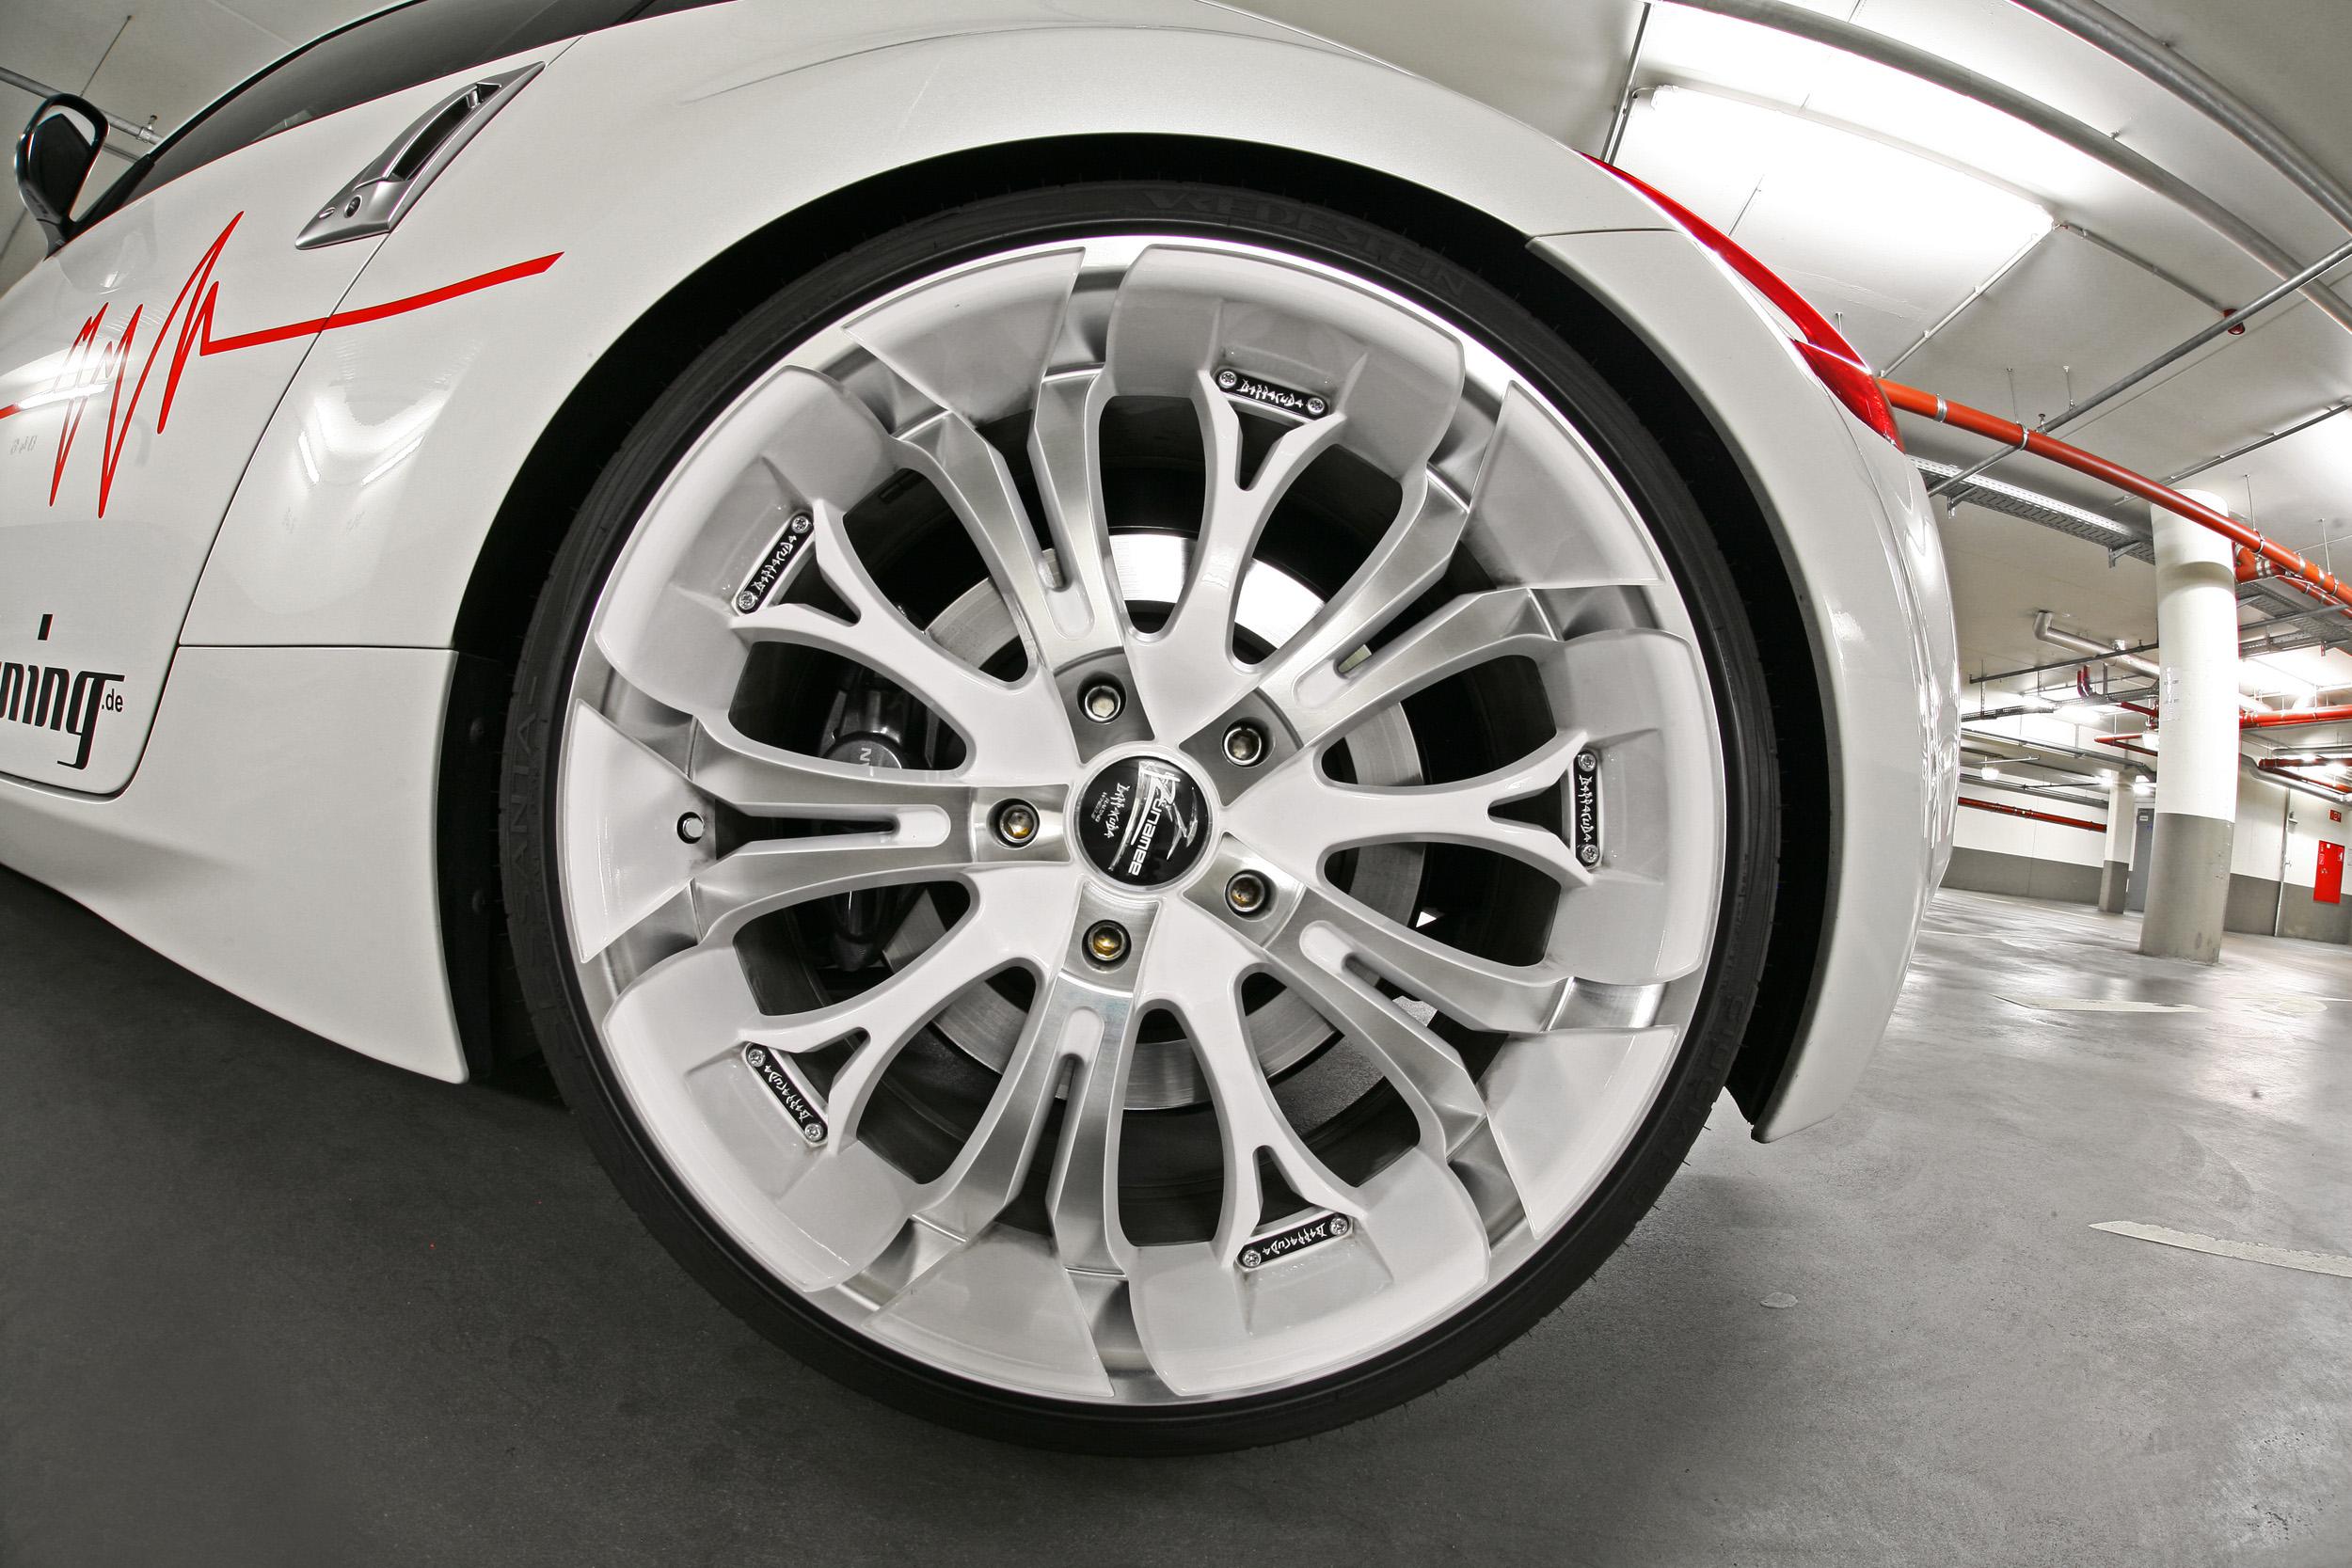 car-vehicle-nissan-sports-car-tire-2013-netcarshow-netcar-car-images-car-photo-wheel-370z-by-senner-tuning-rim-supercar-land-vehicle-automotive-design-automotive-exterior-automobile-make-luxury-vehicle-automotive-ti